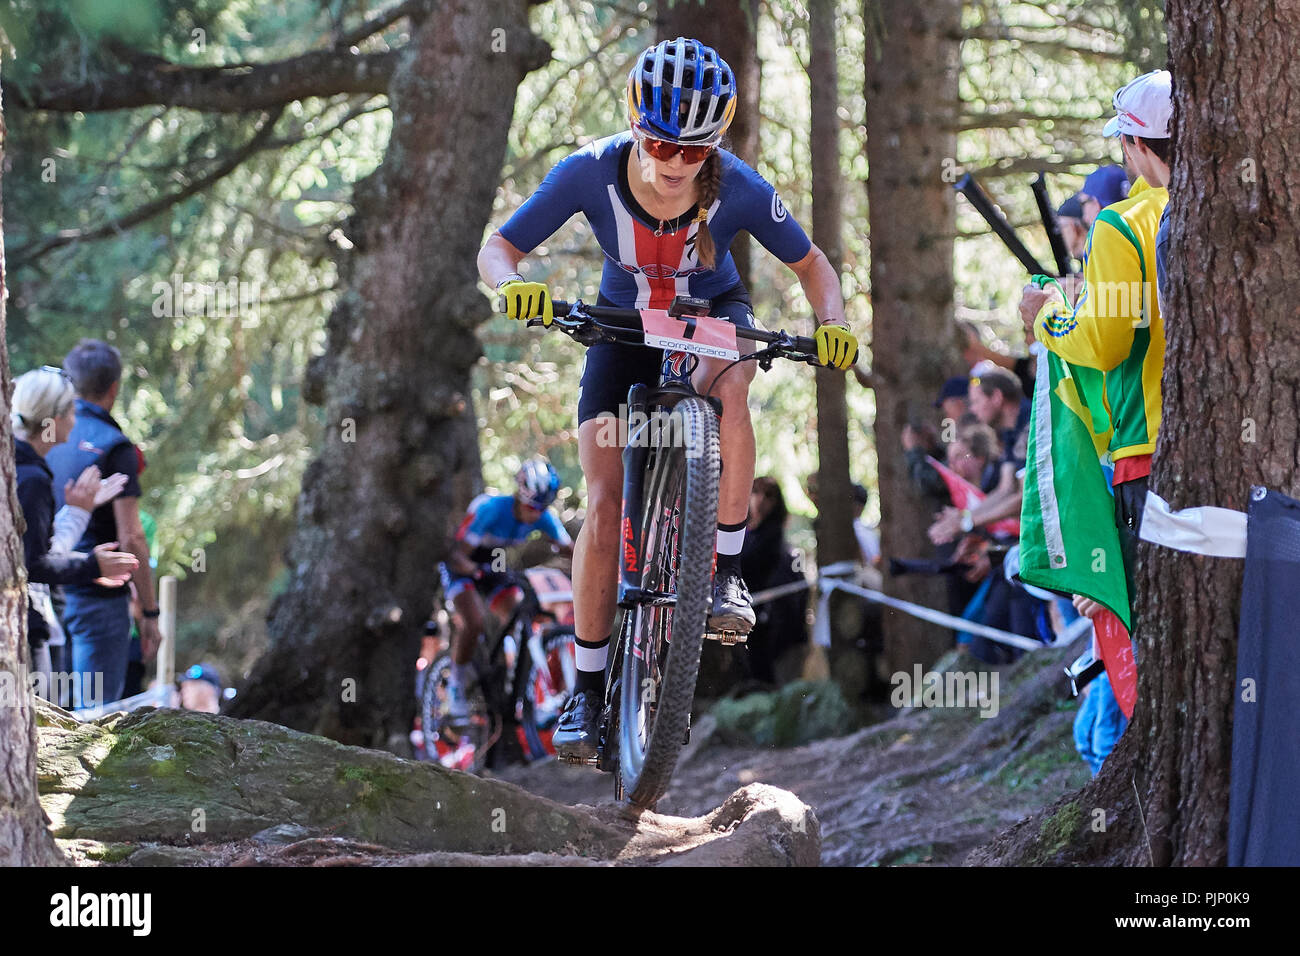 48b20ec690c Kate Courtney during the UCI 2018 Mountain Bike World Championships Women  Elite Cross Country Olympic XCO in Lenzerheide. Credit: Rolf Simeon/Alamy  Live ...